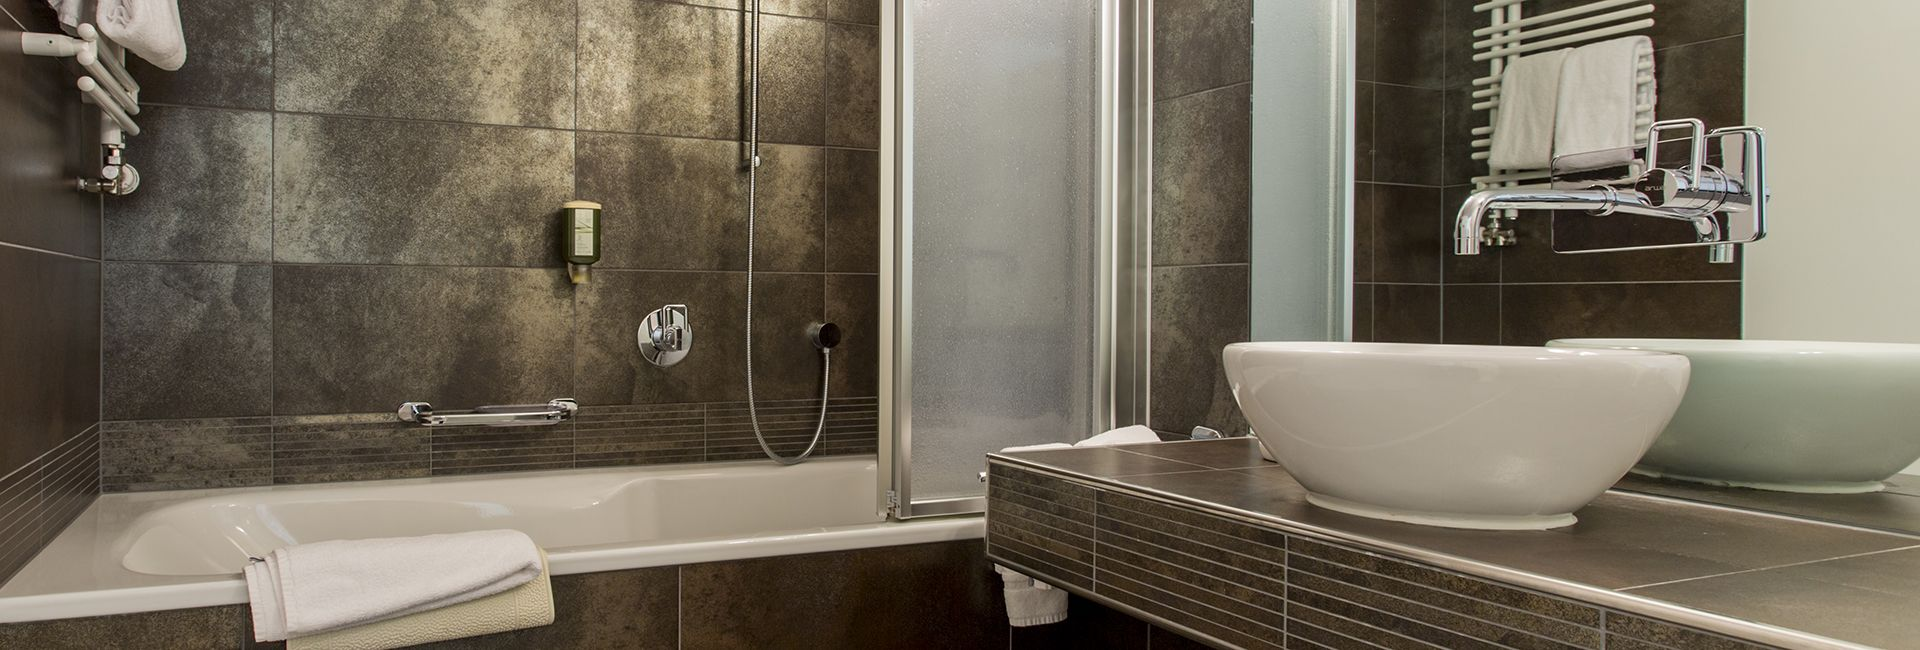 Badezimmer Casa Juliana, Hotel Cresta Flims